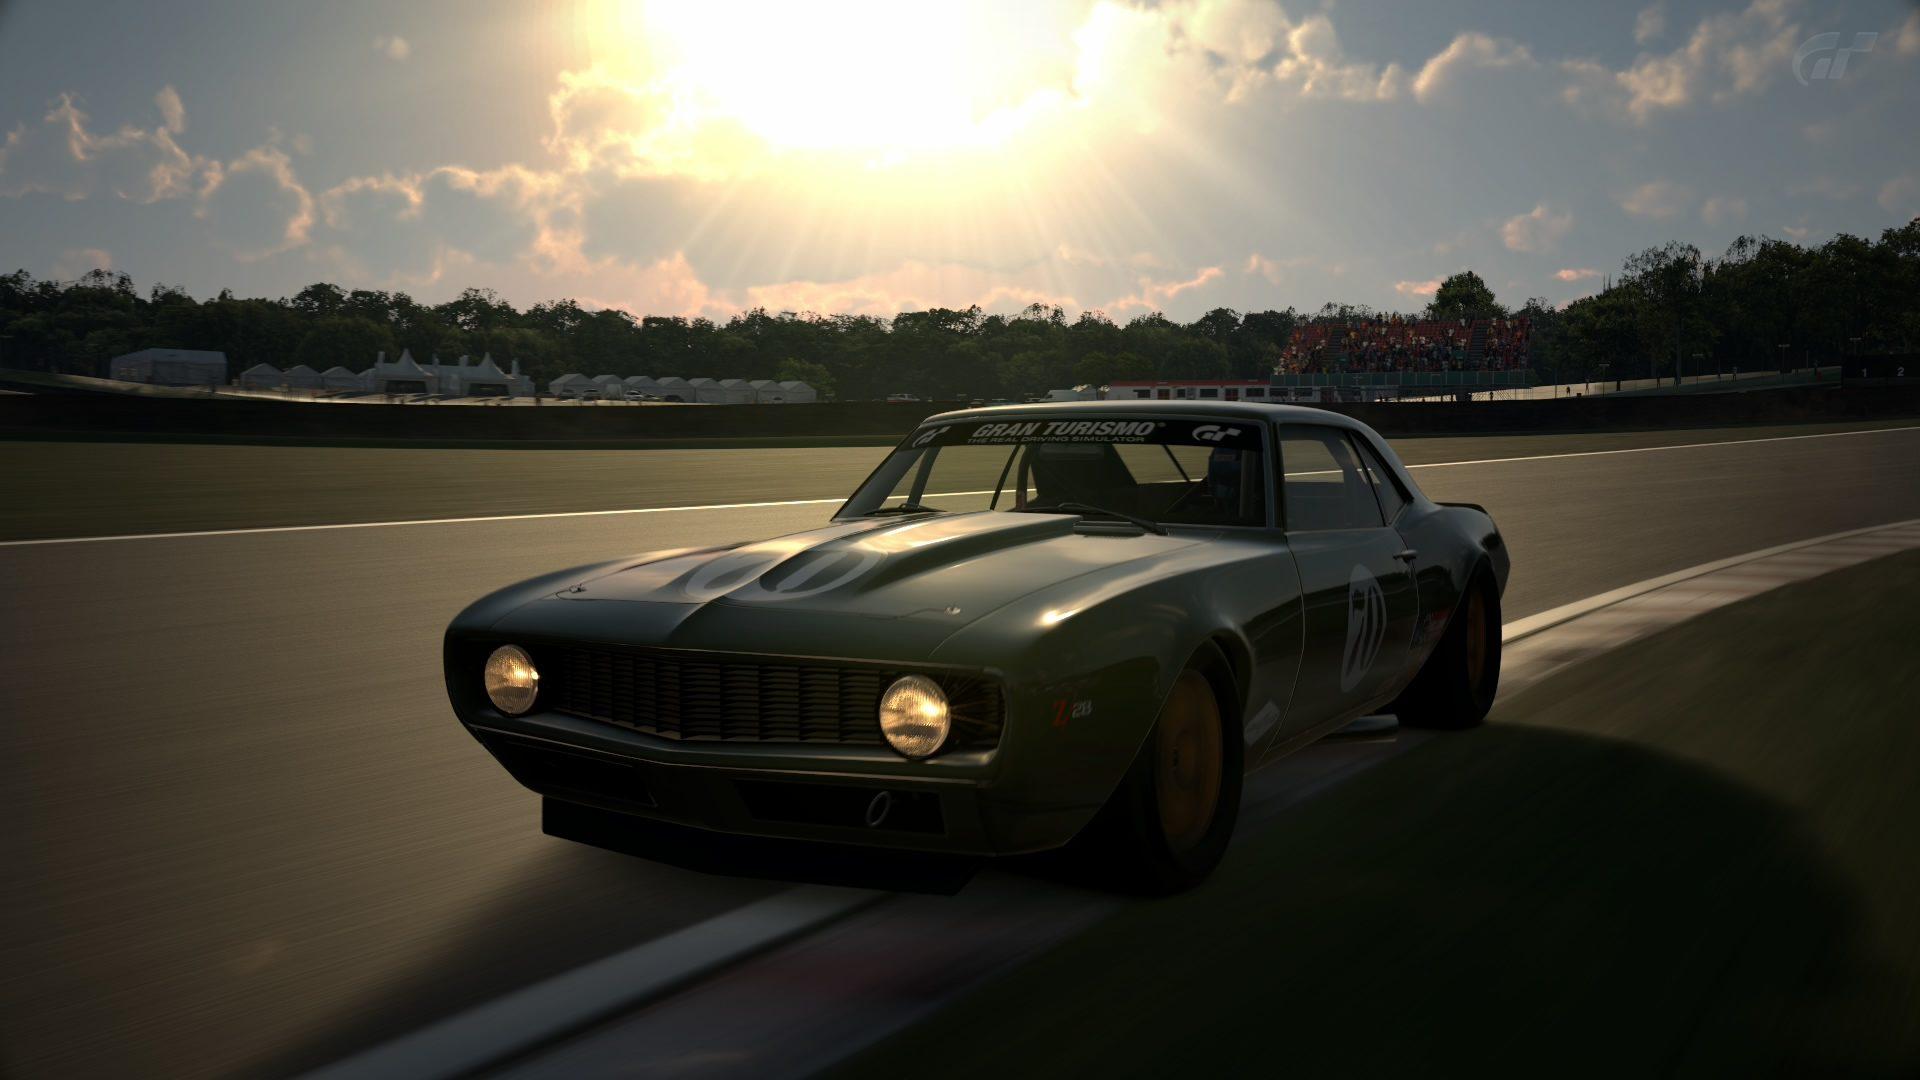 Brands Hatch Indy Circuit '80s_2.jpg